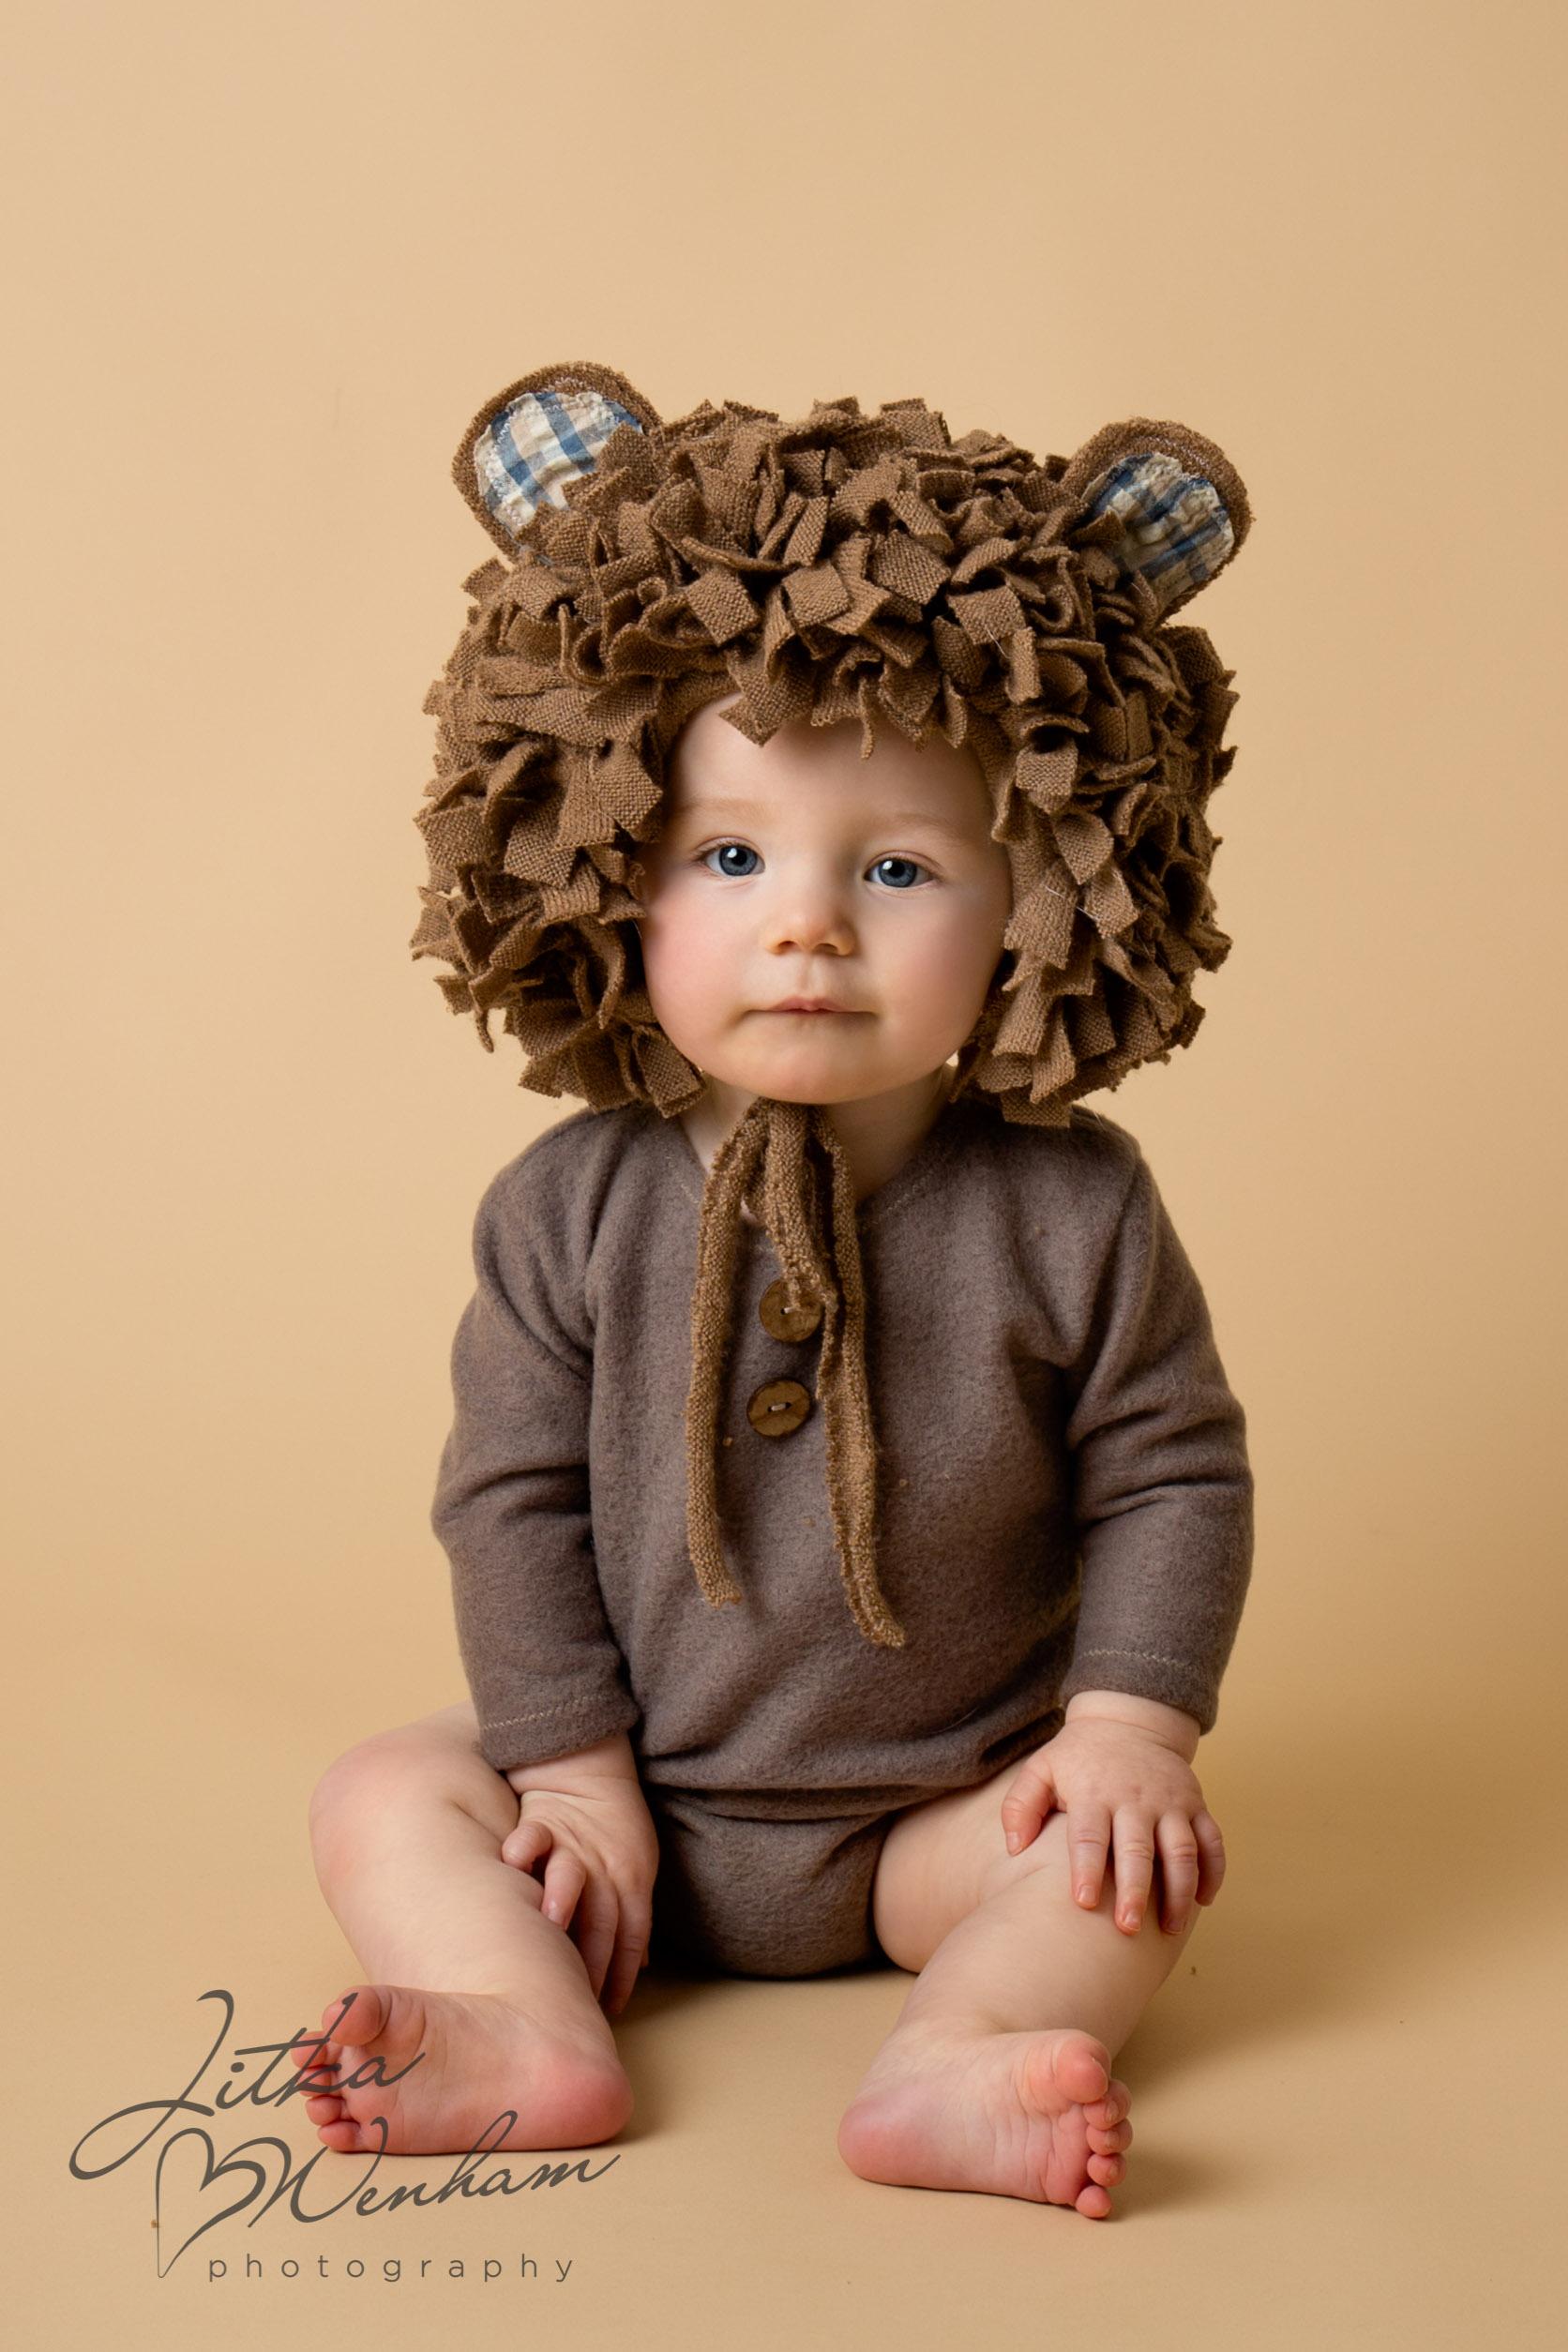 newborn-photography-children-baby-milton keynes-cake-smash-1-9.jpg